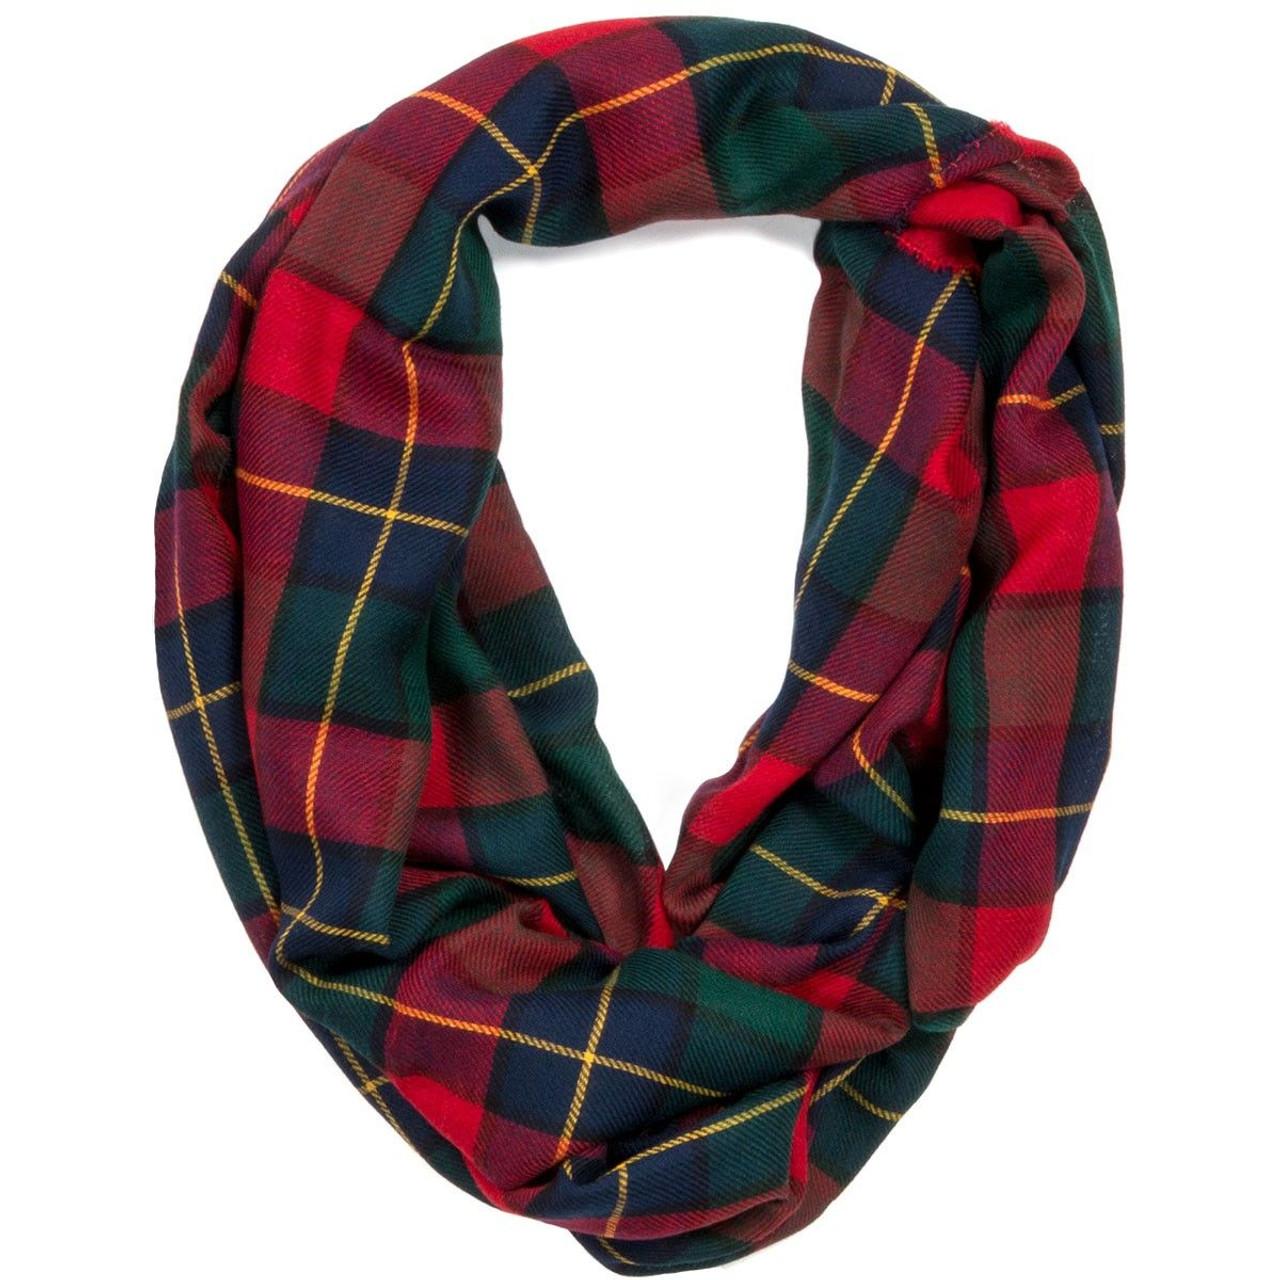 945ae53cde782 Kilgour Modern Tartan Fine Wool Infinity Scarve - Burnett's & Struth  Scottish Regalia